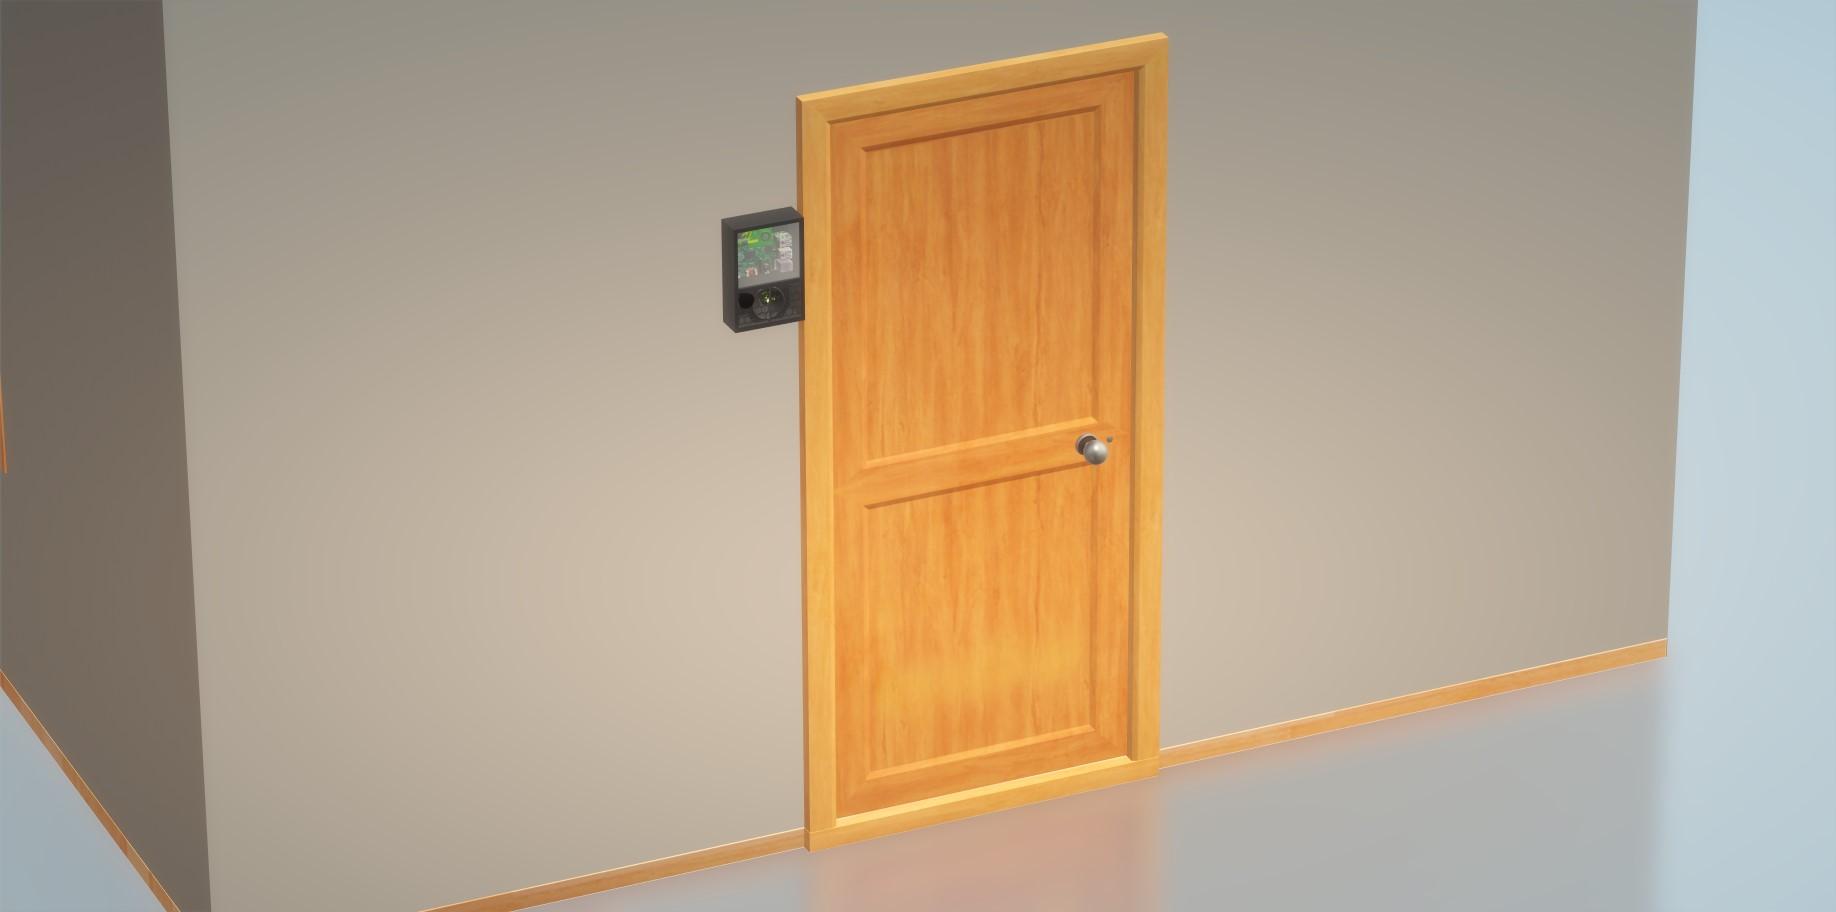 Nevon Contactless IOT Doorbell & Security System